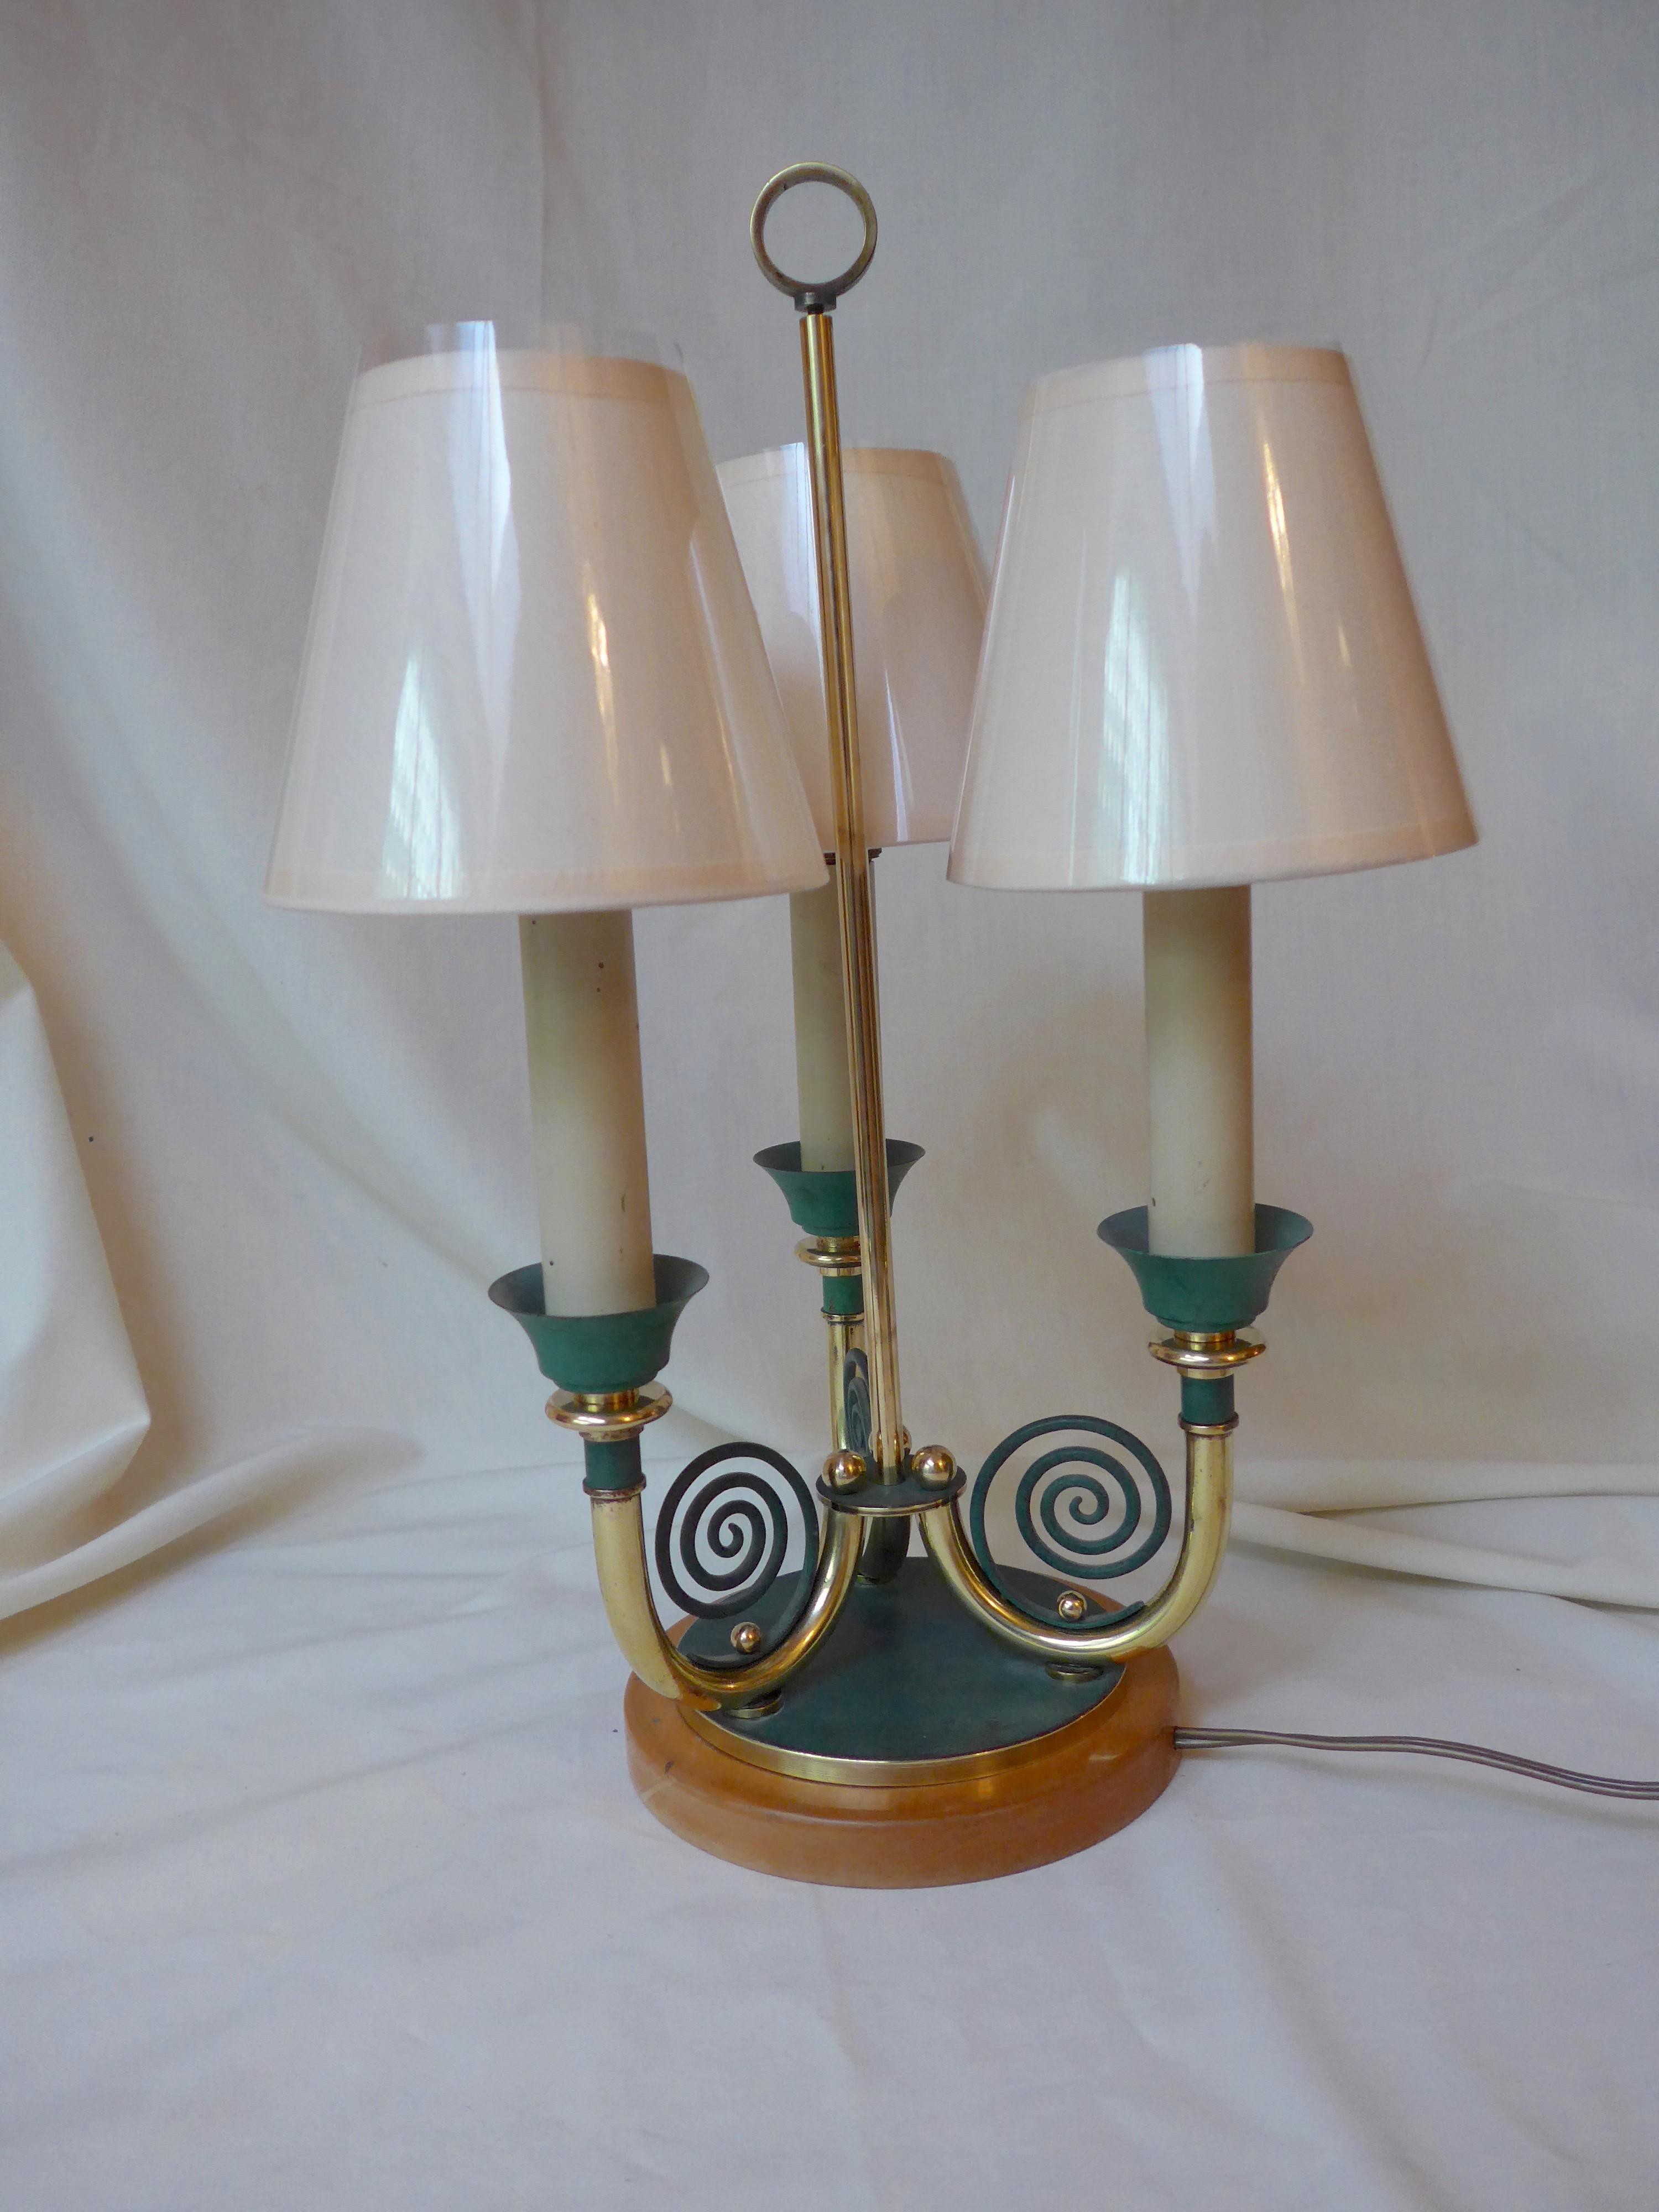 lampe bouillotte ann es 40 50 antiquit opio. Black Bedroom Furniture Sets. Home Design Ideas